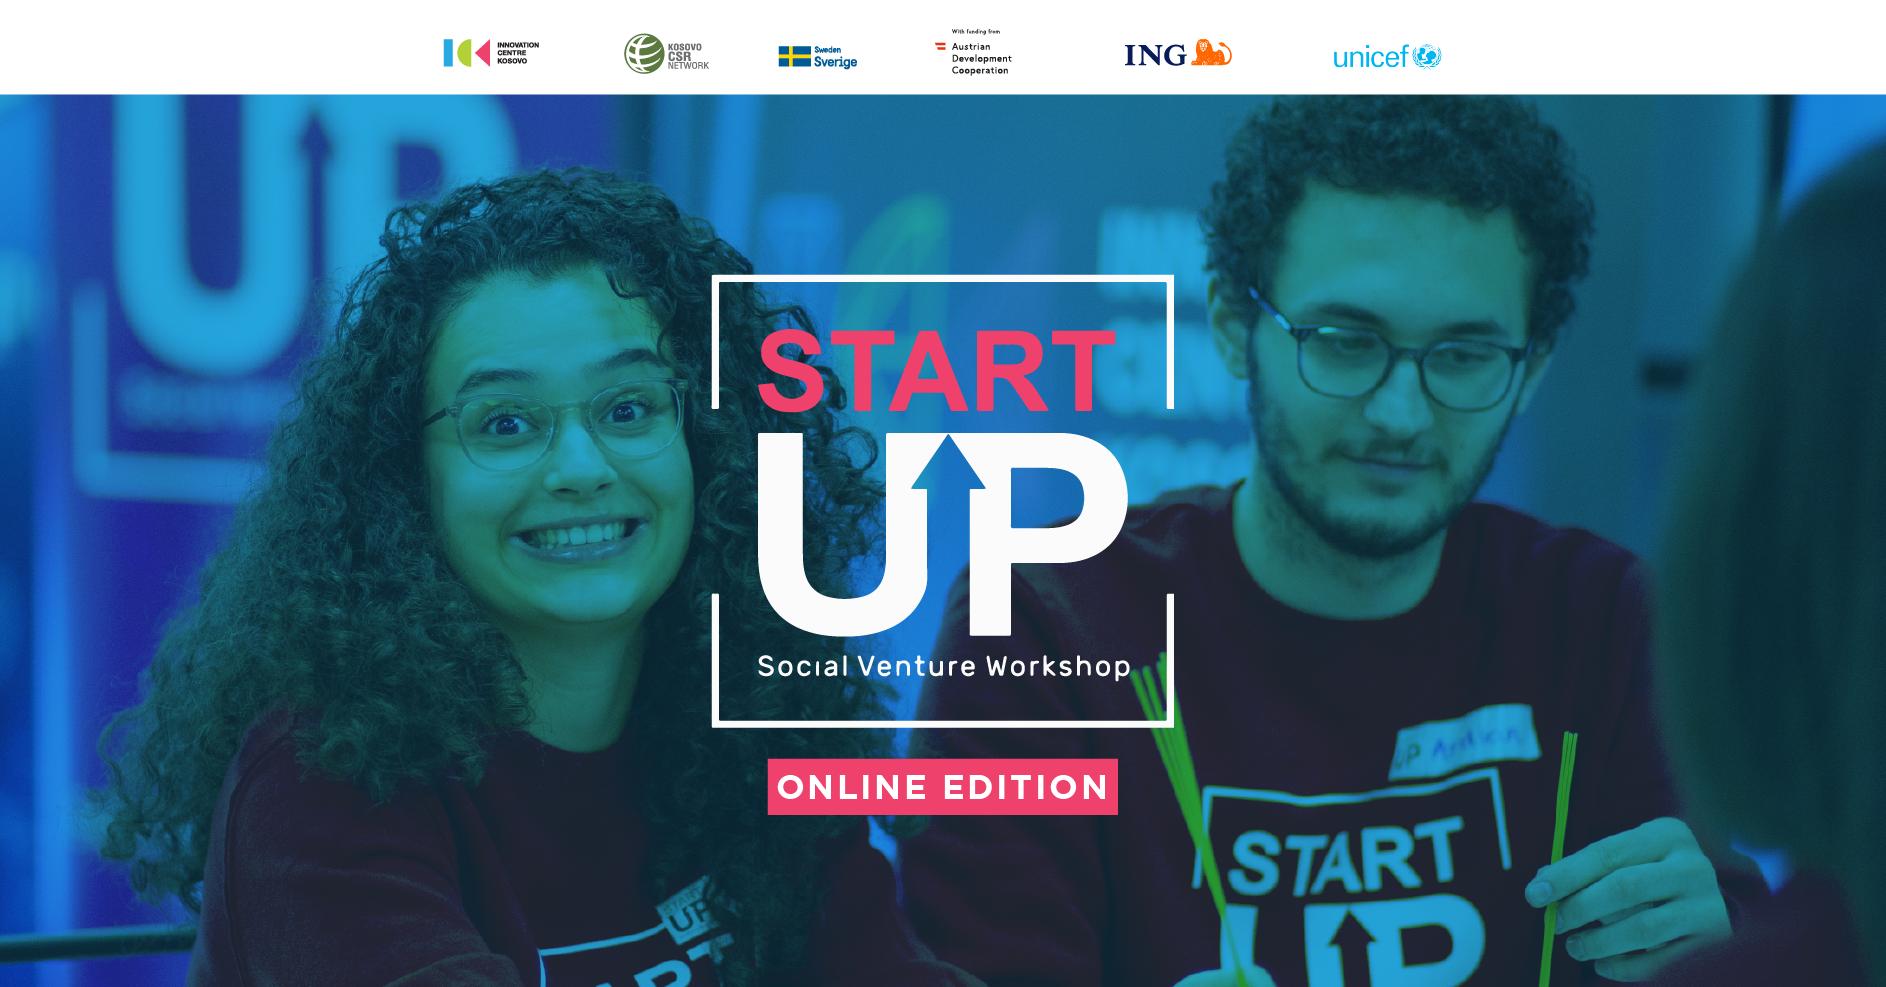 Startup Social Venture Workshop (Online) - Turn your social business ideas real